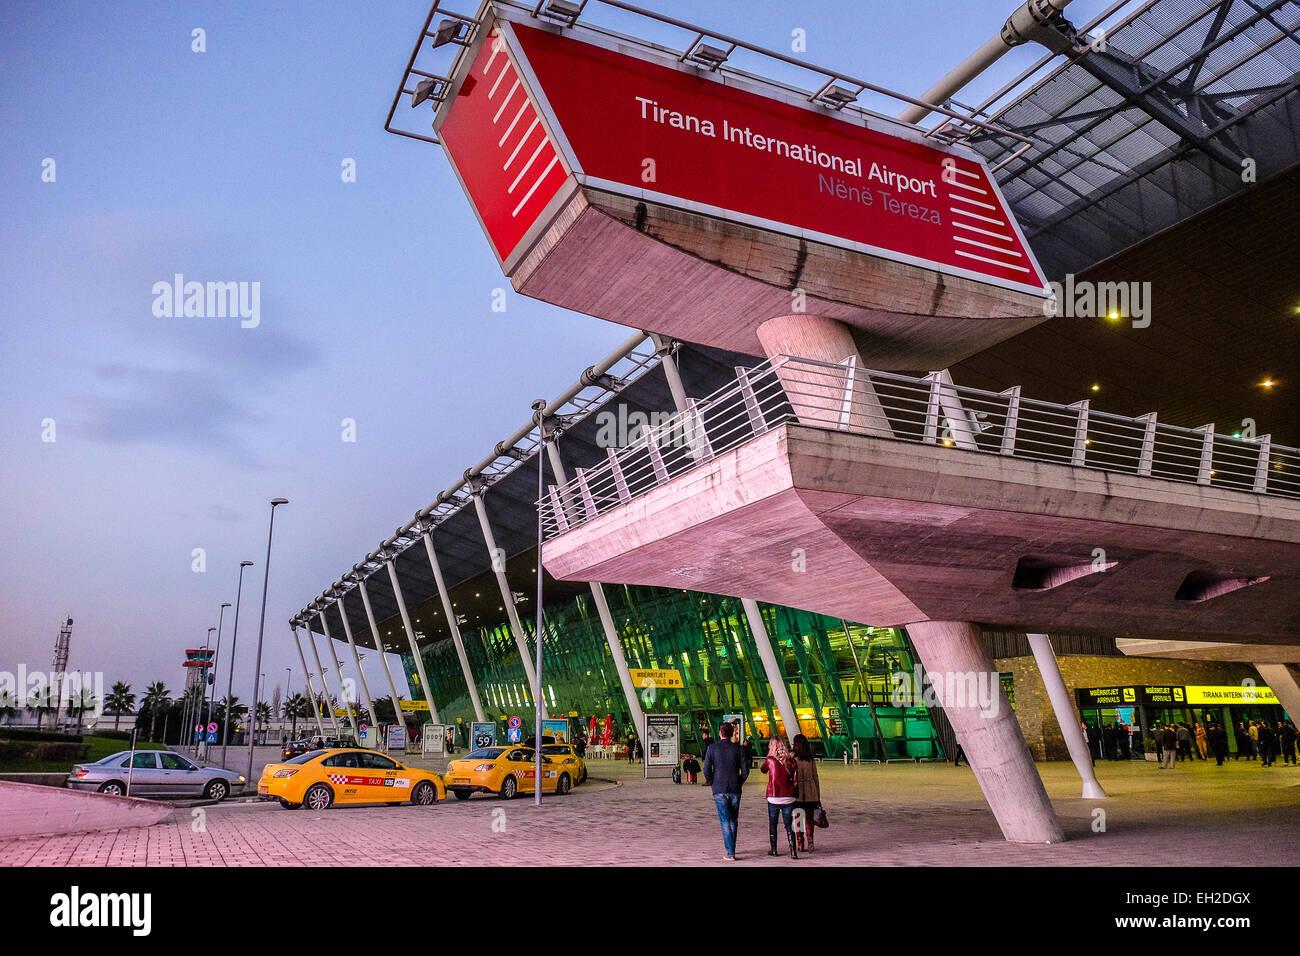 Albania, Tirana, the airport - Stock Image